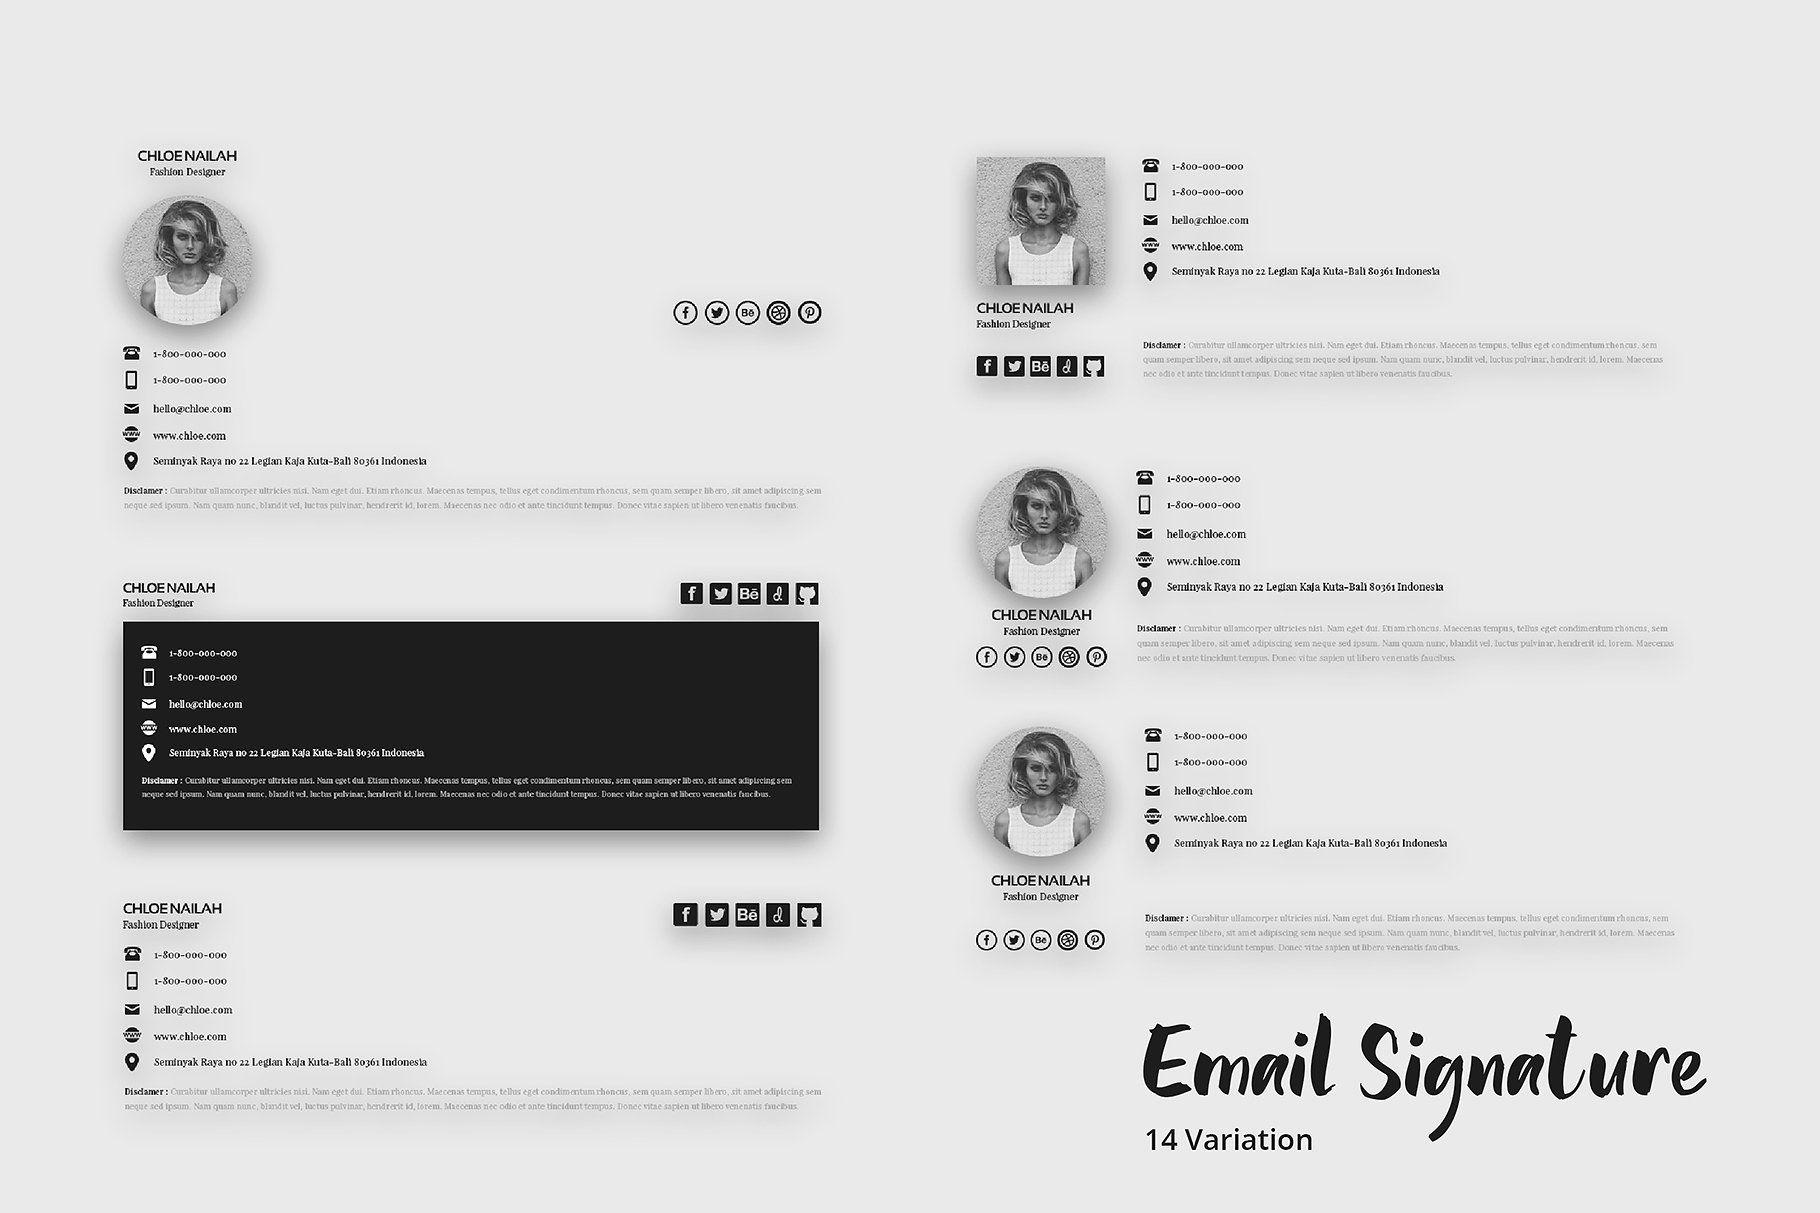 Email Signature Template Email signature templates